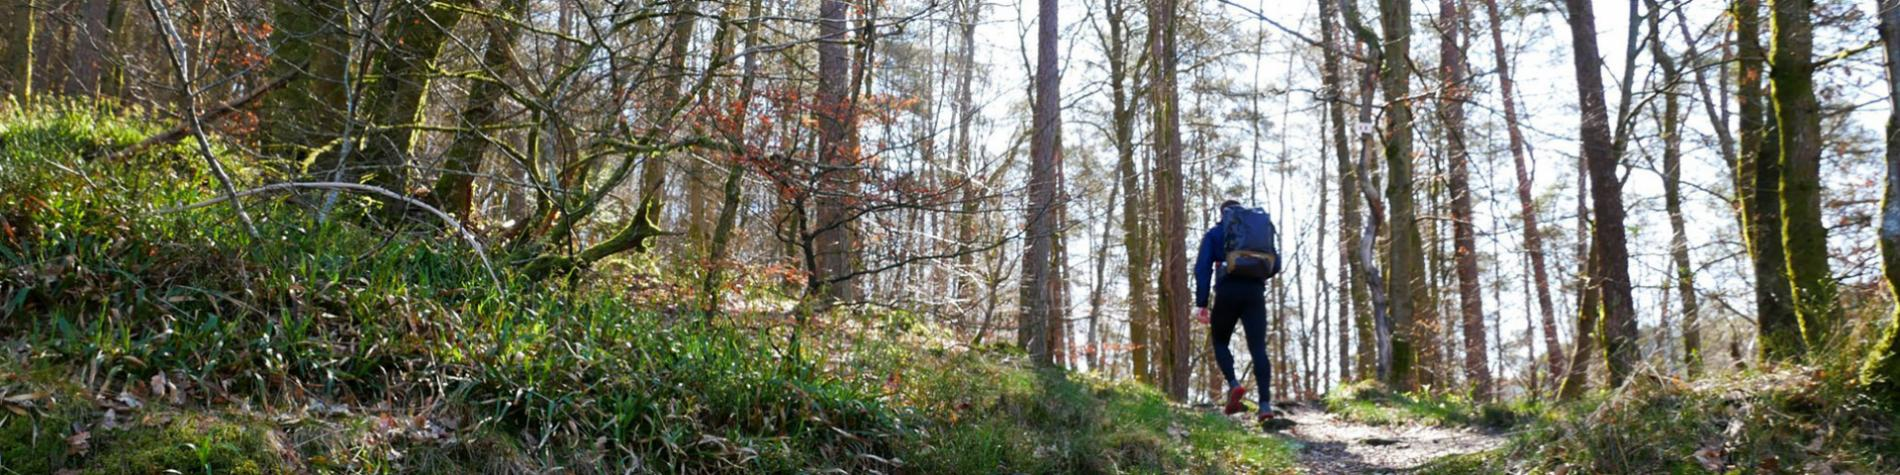 Forêt de la Semois -la Houille - terre sauvage - massif naturel -